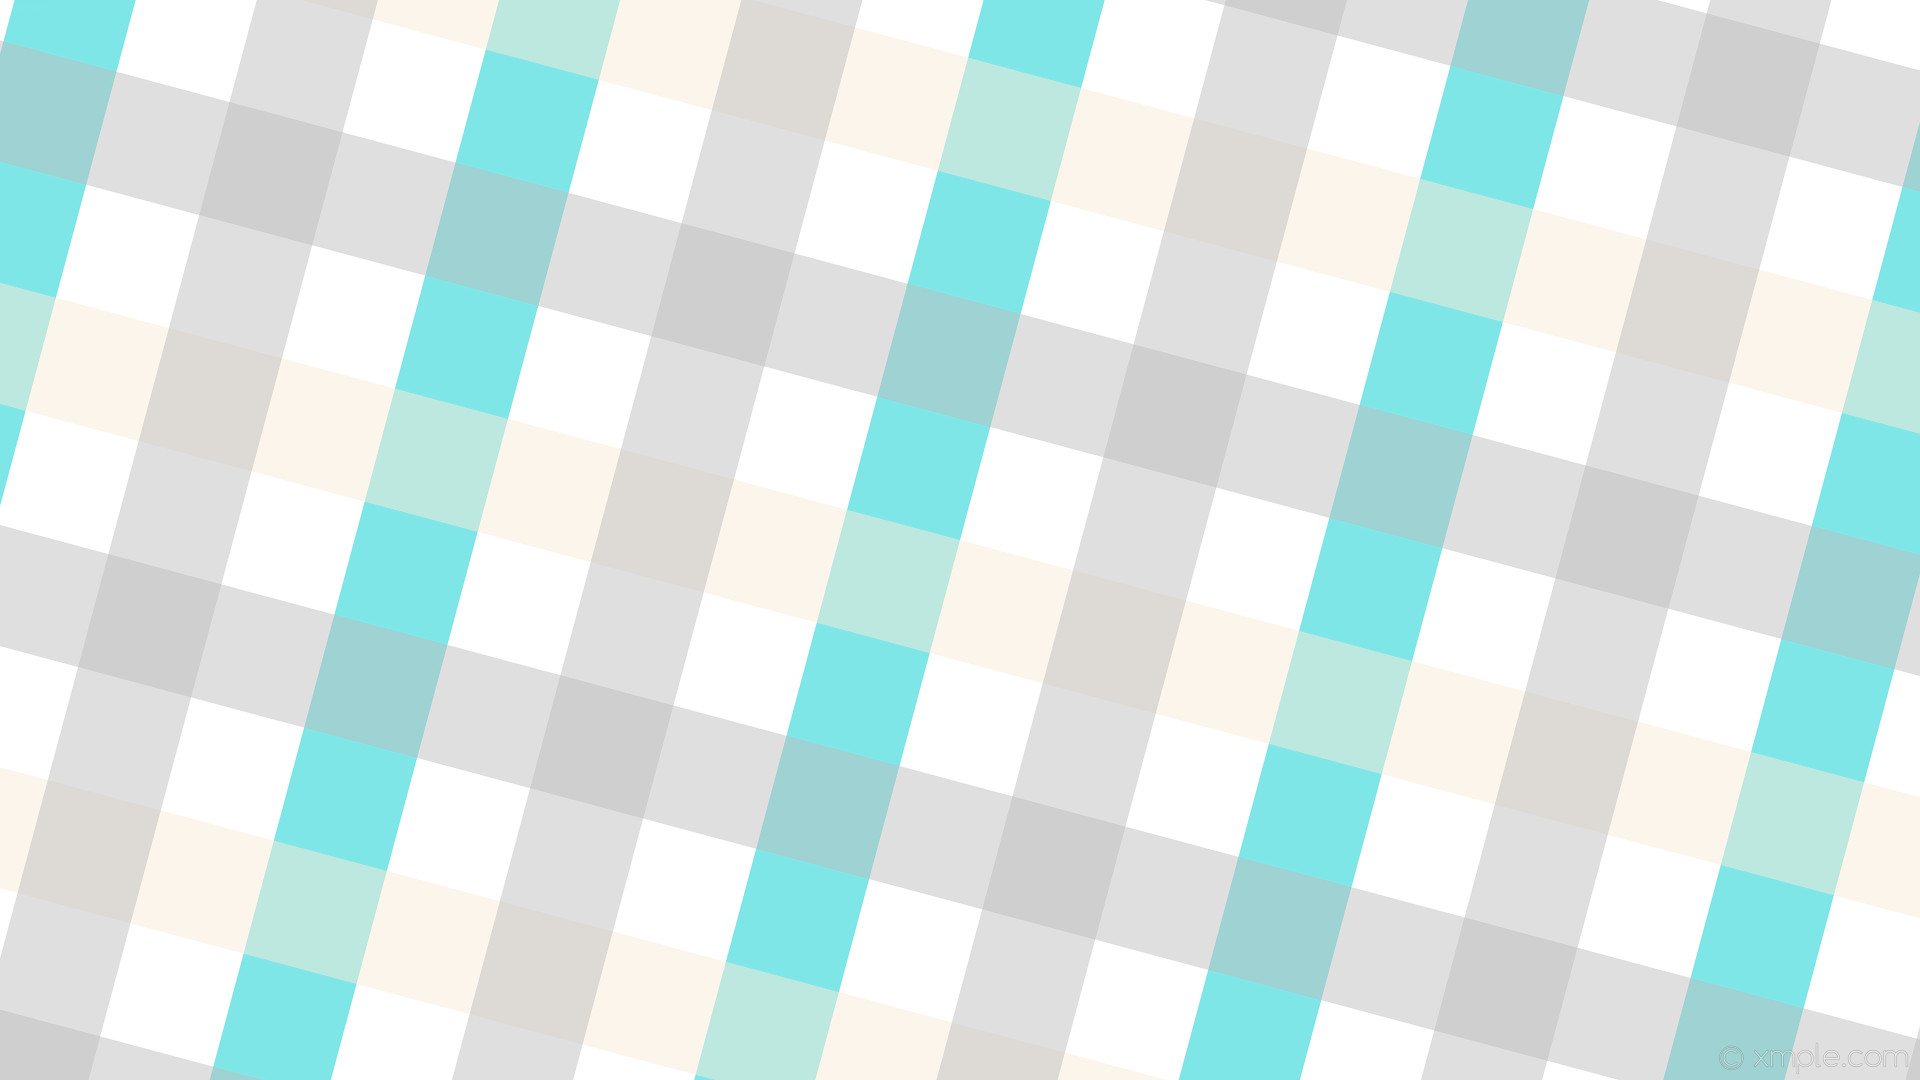 wallpaper white gingham quad blue striped grey dark turquoise antique white  silver #ffffff #00ced1